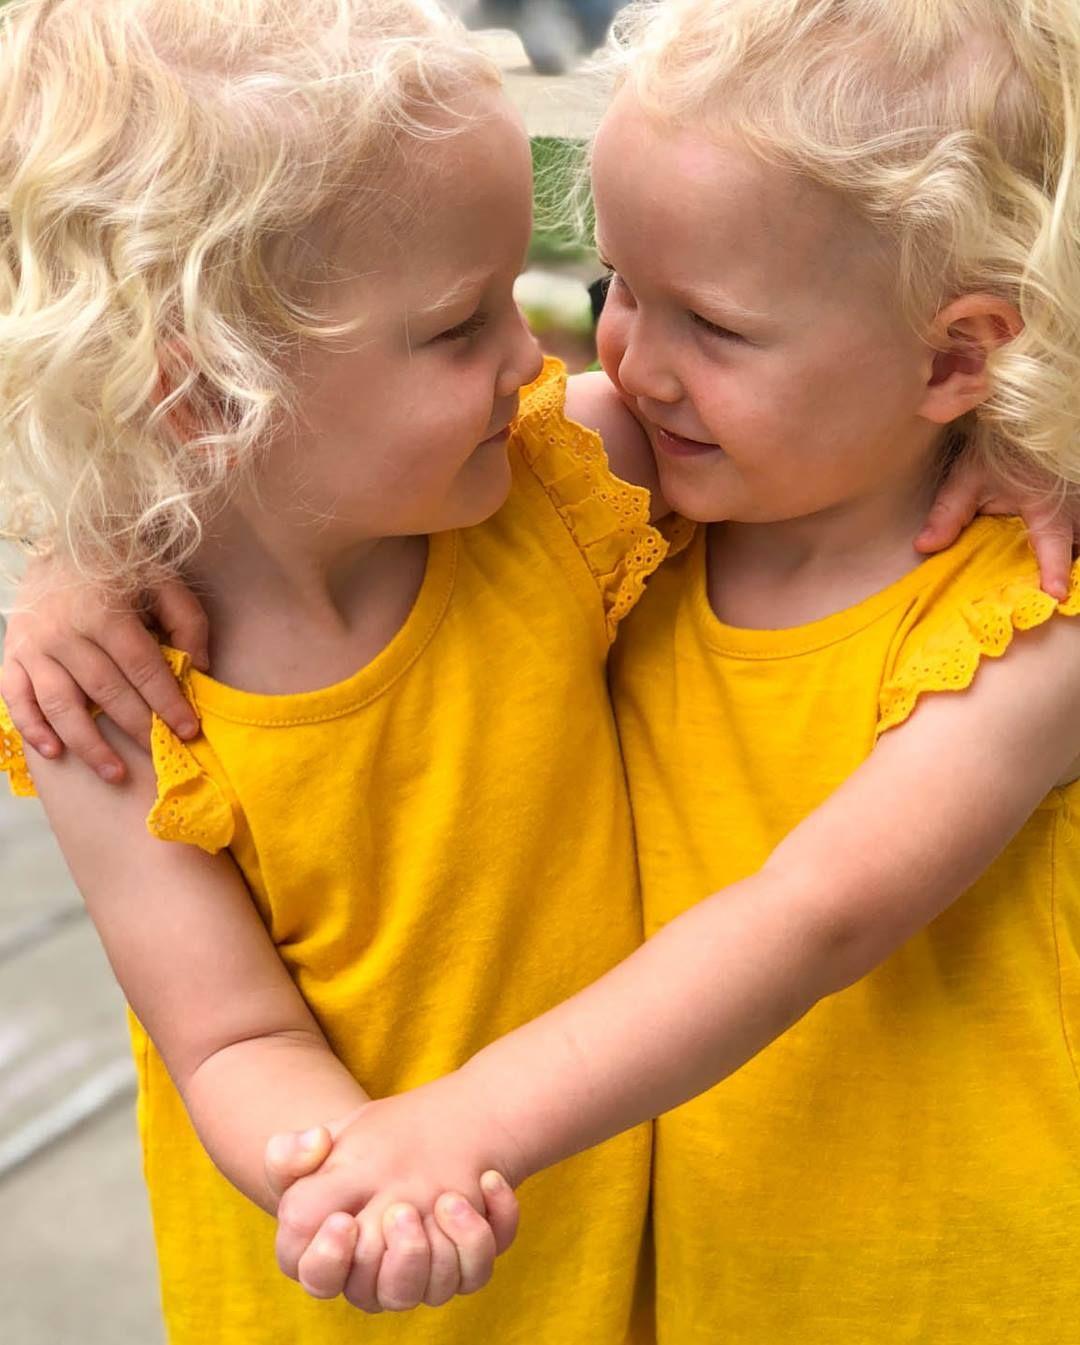 Twins Blonde Haired Twins Modi Twins Twin Sisters Twin Bond